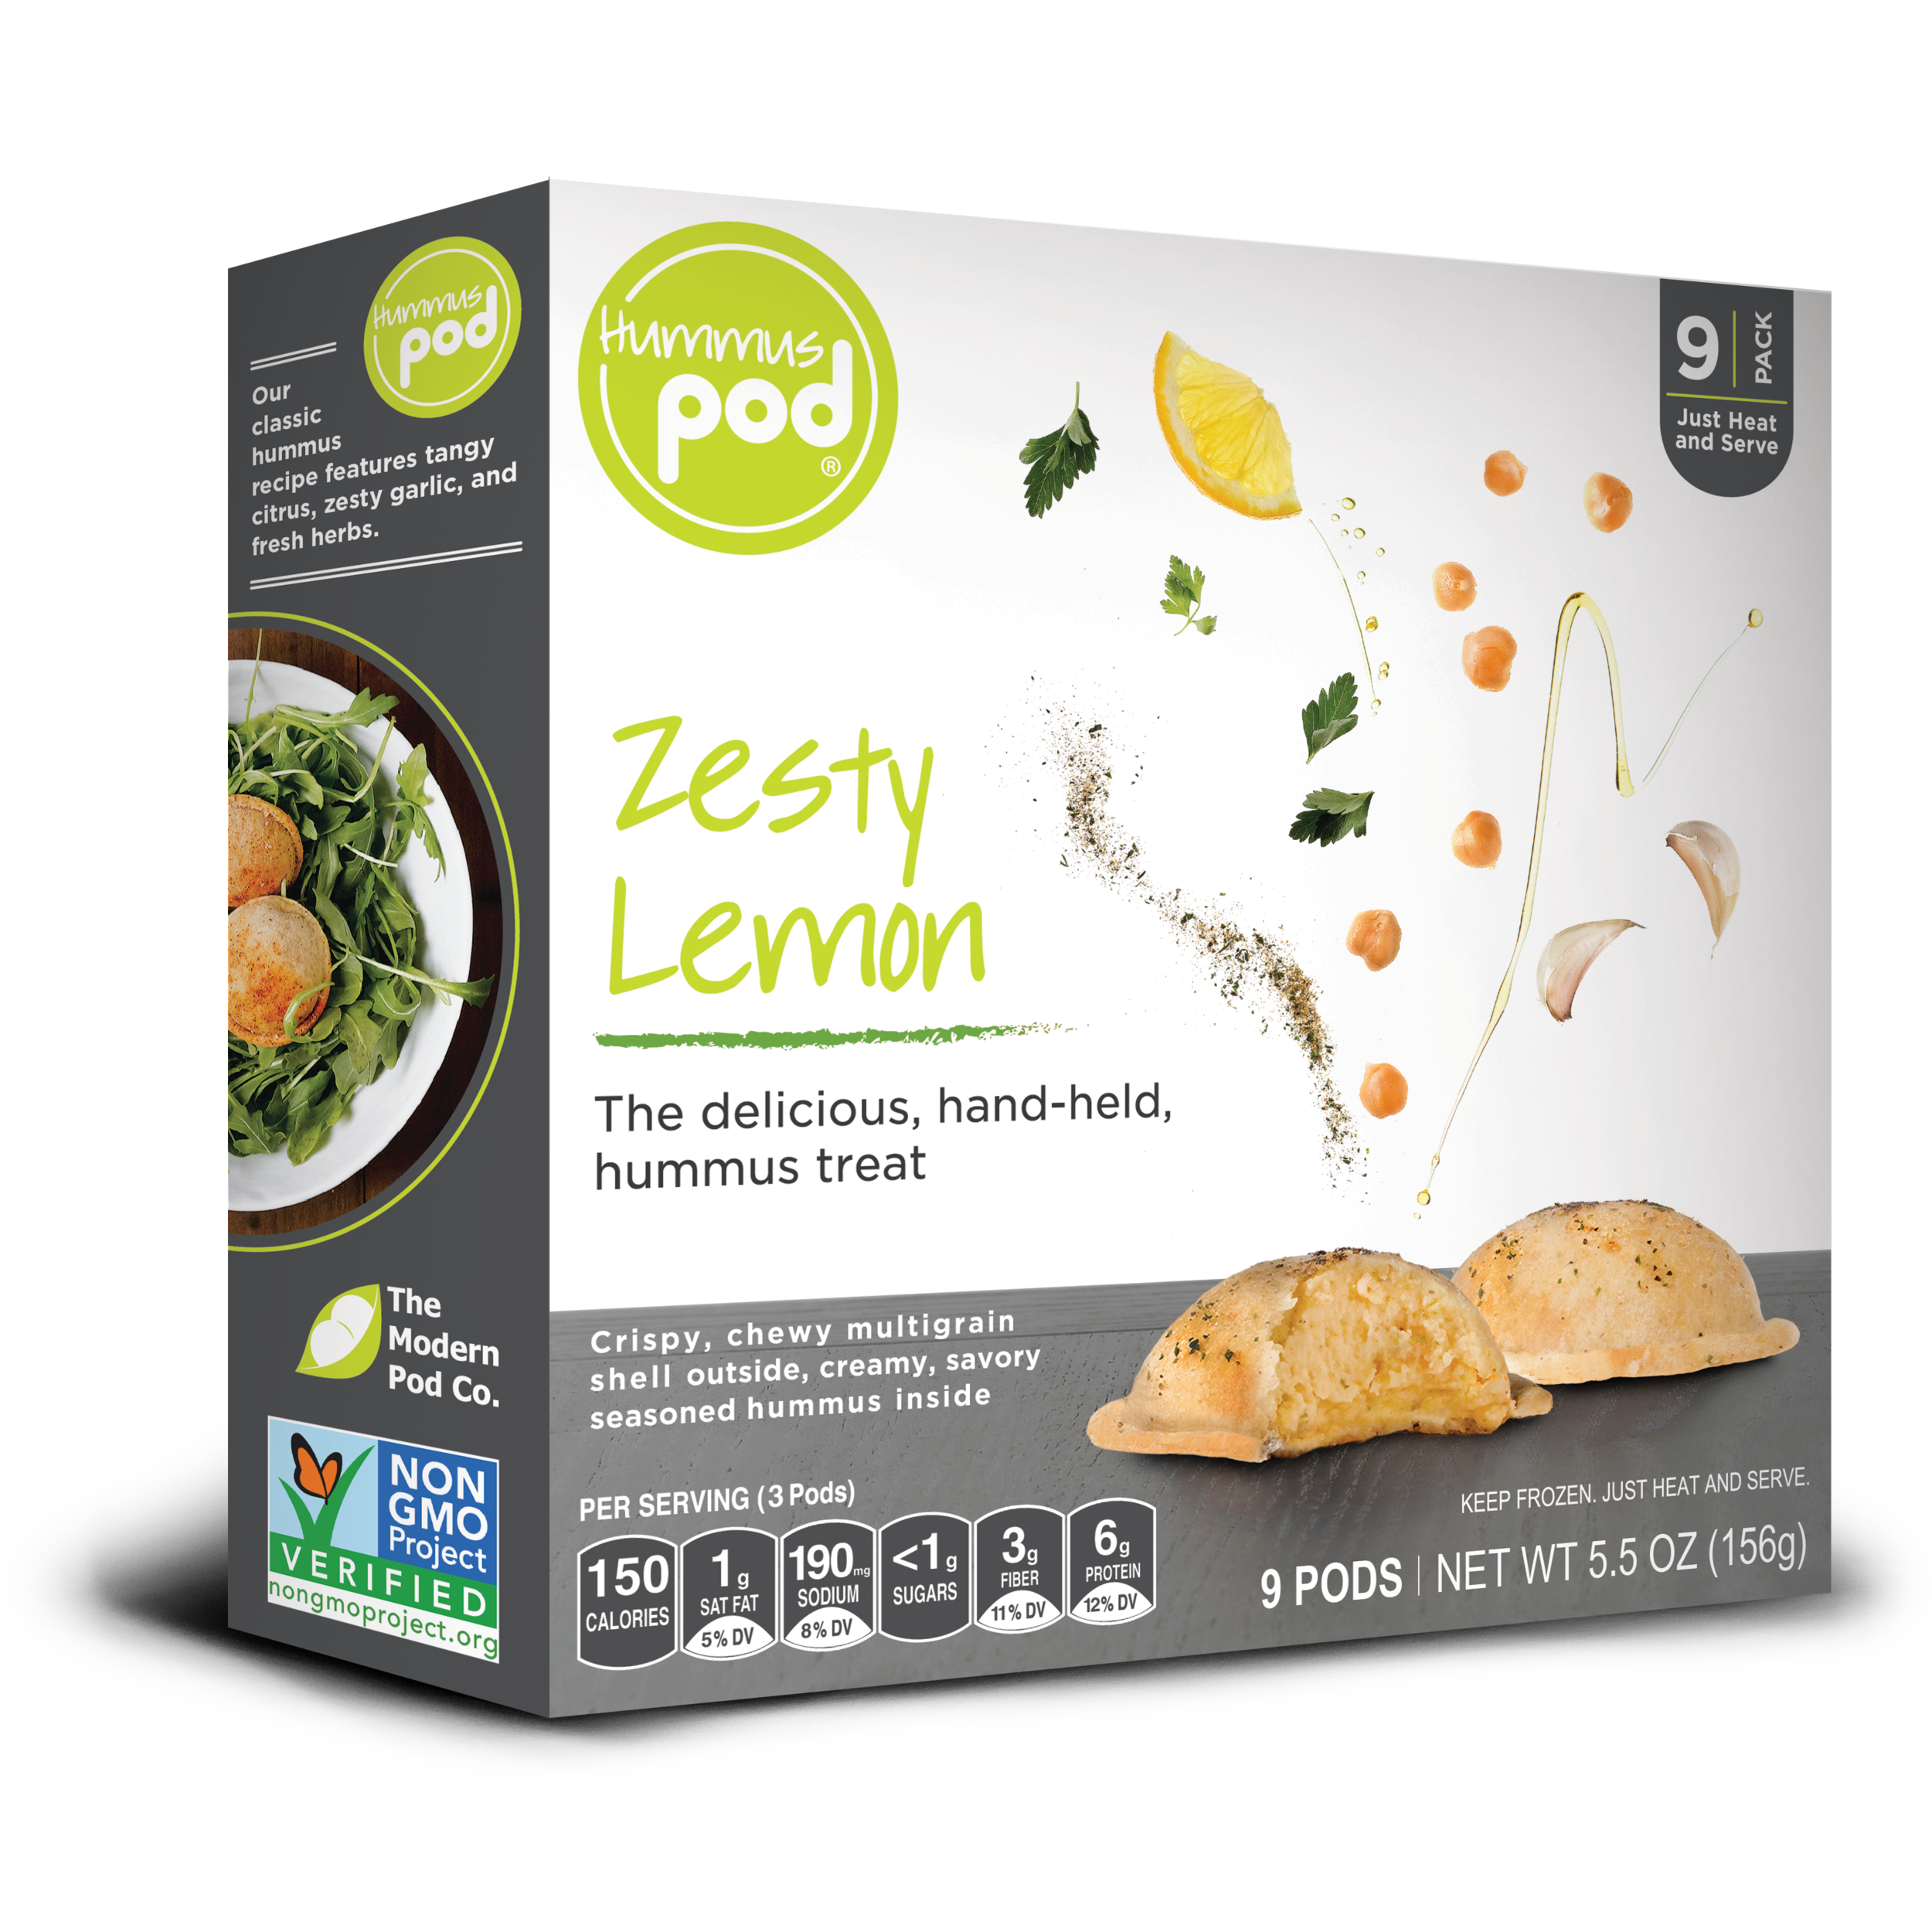 Zesty Lemon Hummus Pods. The delicious healthy hummus treat.